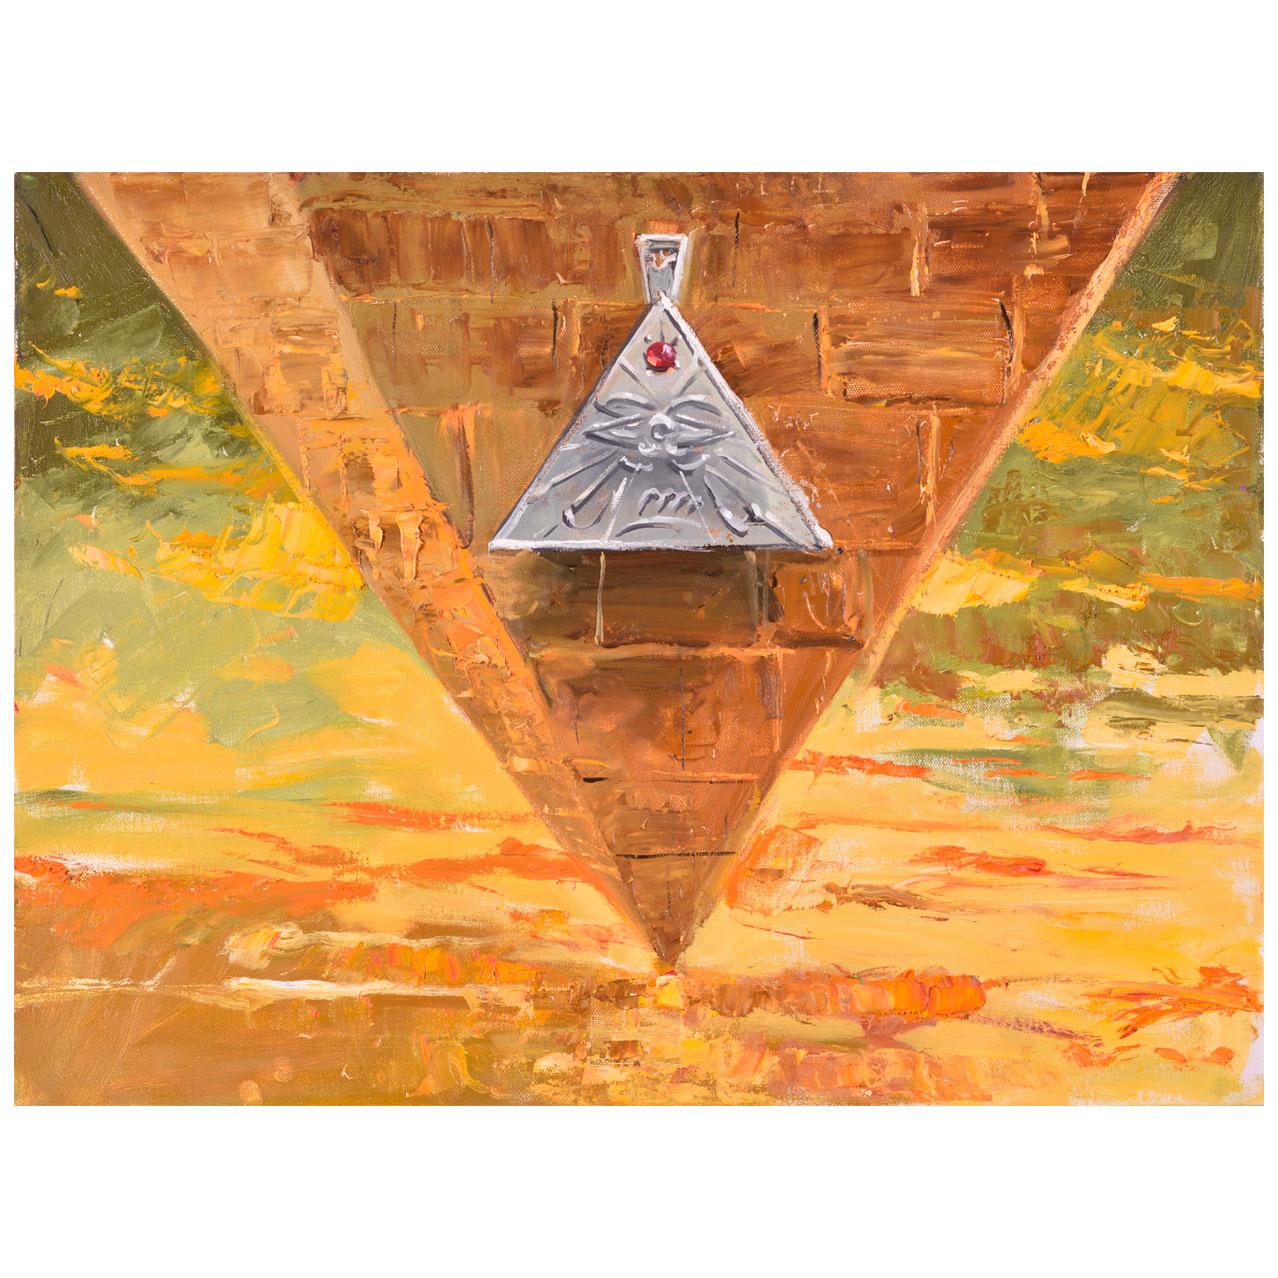 Картина Мехди Эбрагими Вафа «Пирамида». Галерея искусств «Жуковка Арт»